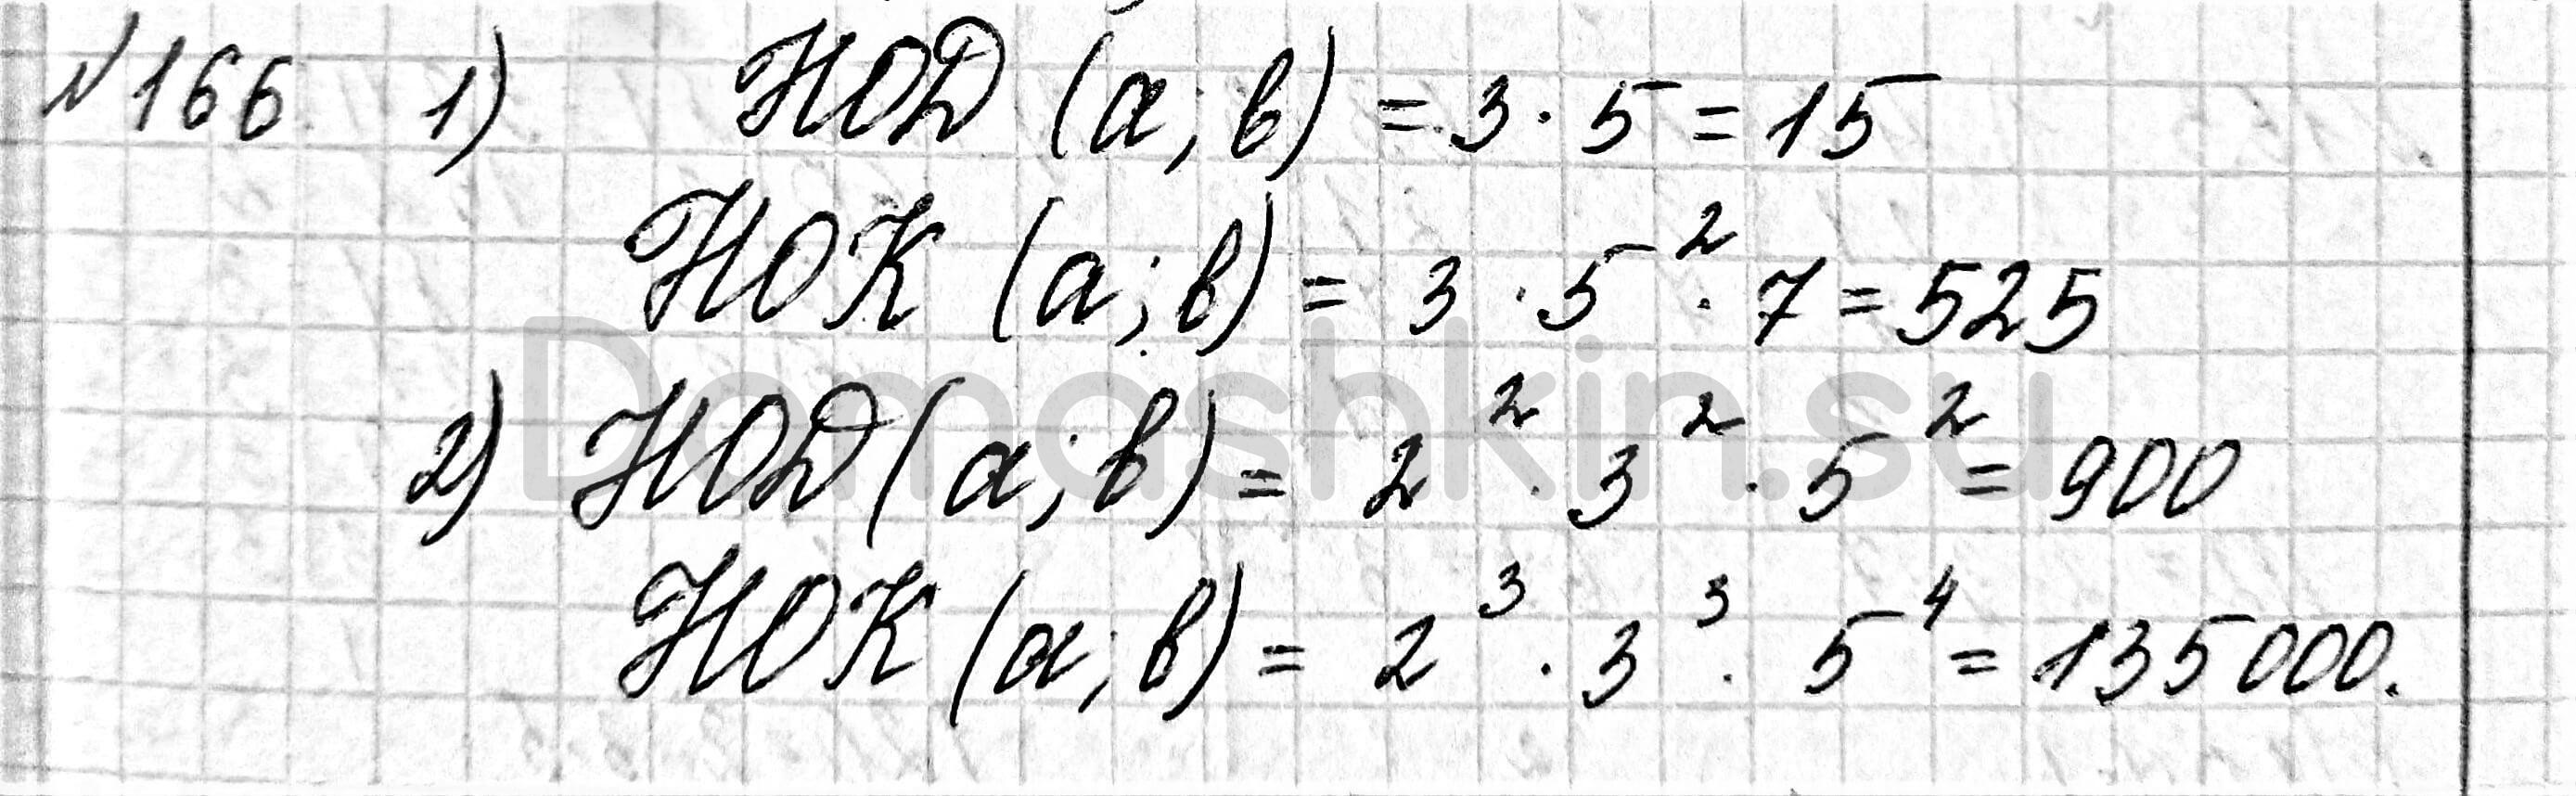 Математика 6 класс учебник Мерзляк номер 166 решение